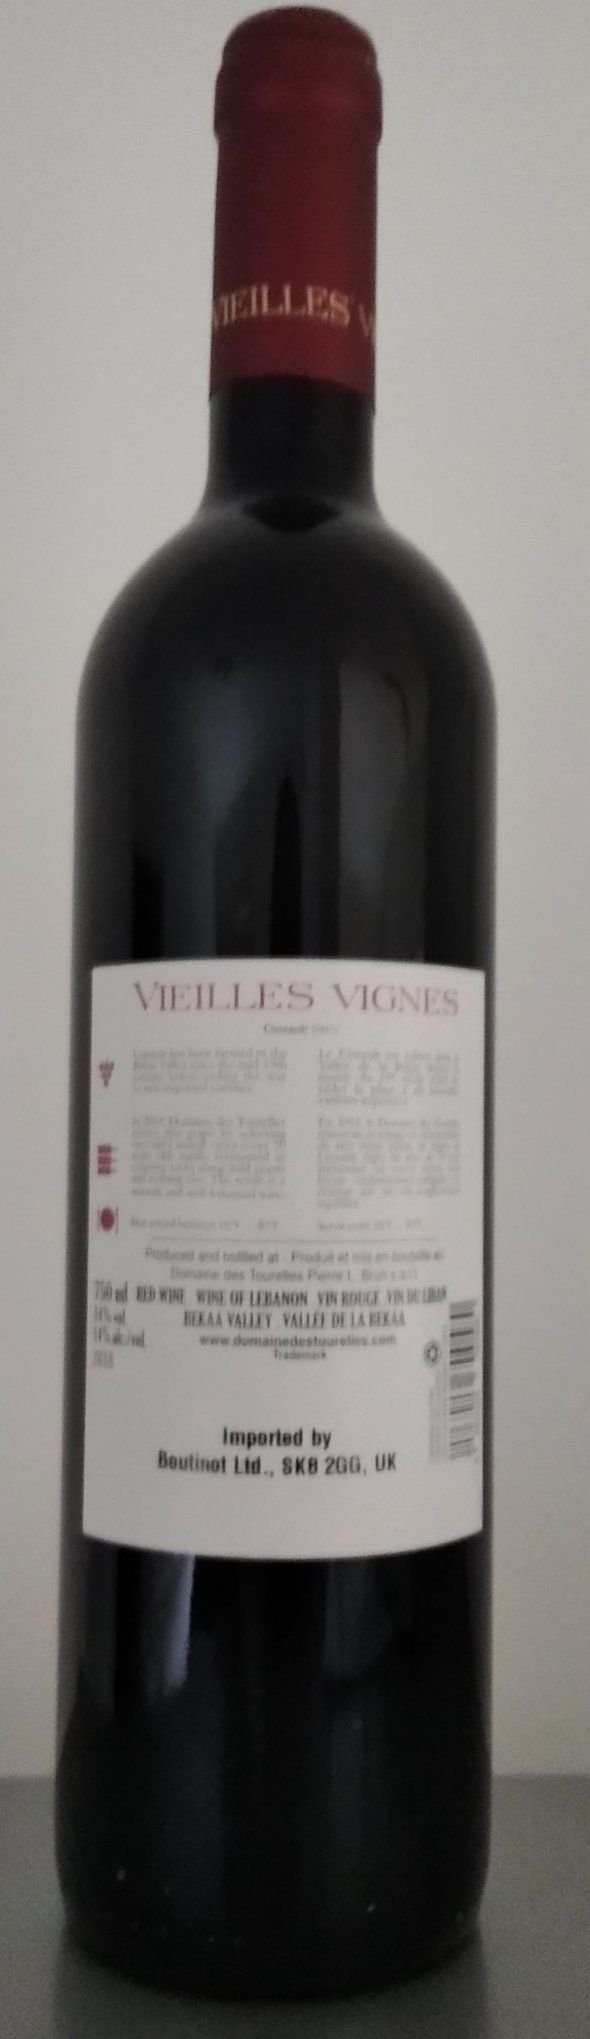 Cinsault, VIeilles Vignes